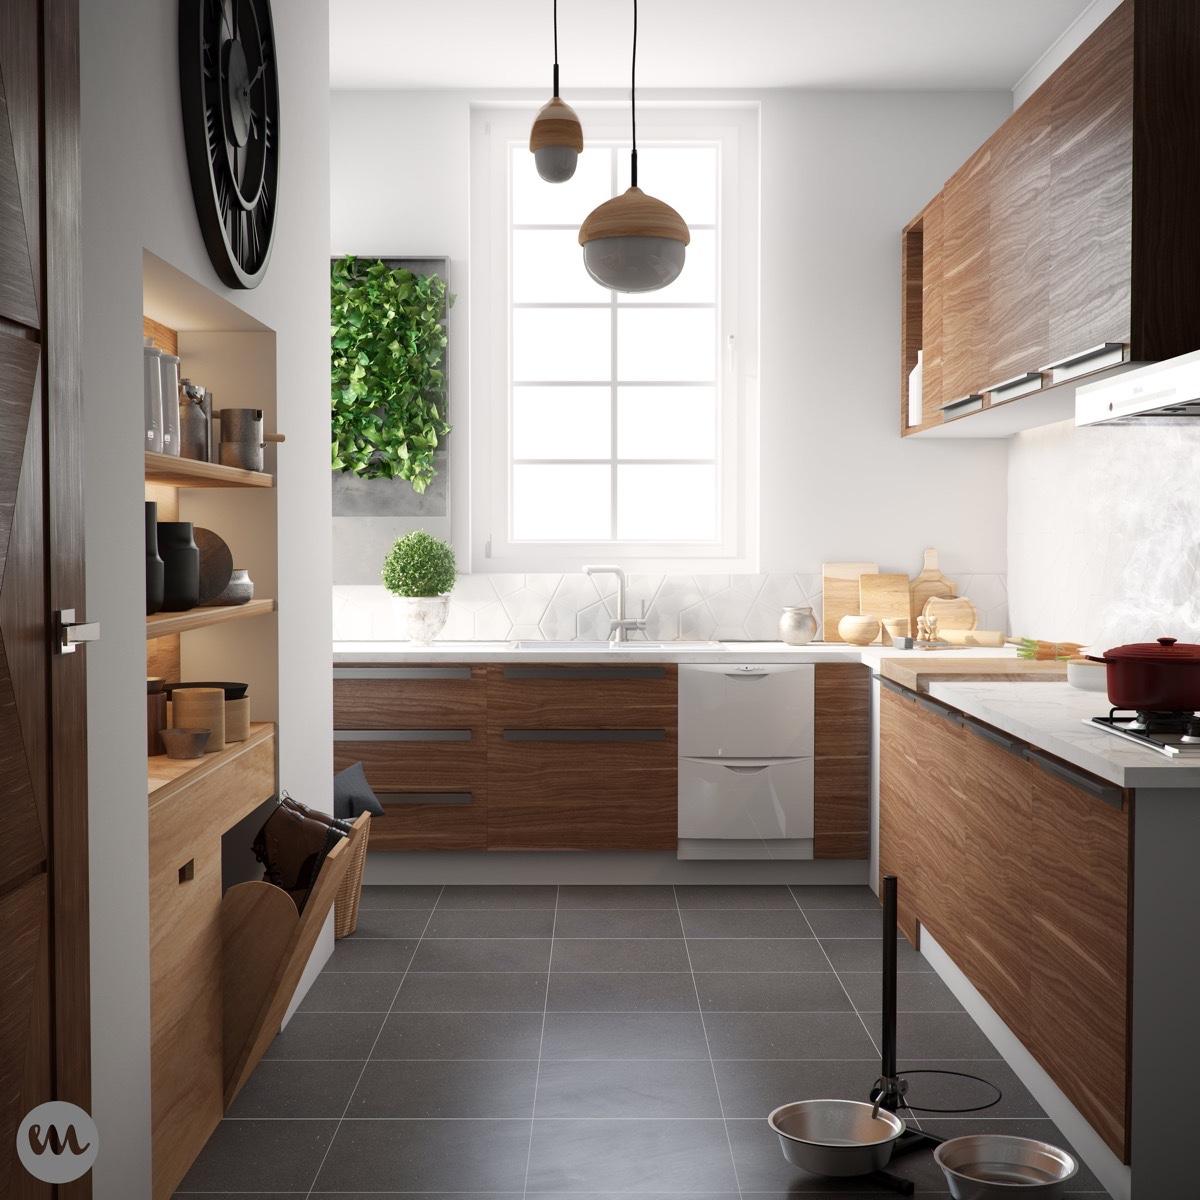 IKEA-kitchen-varnished-wooden-panels